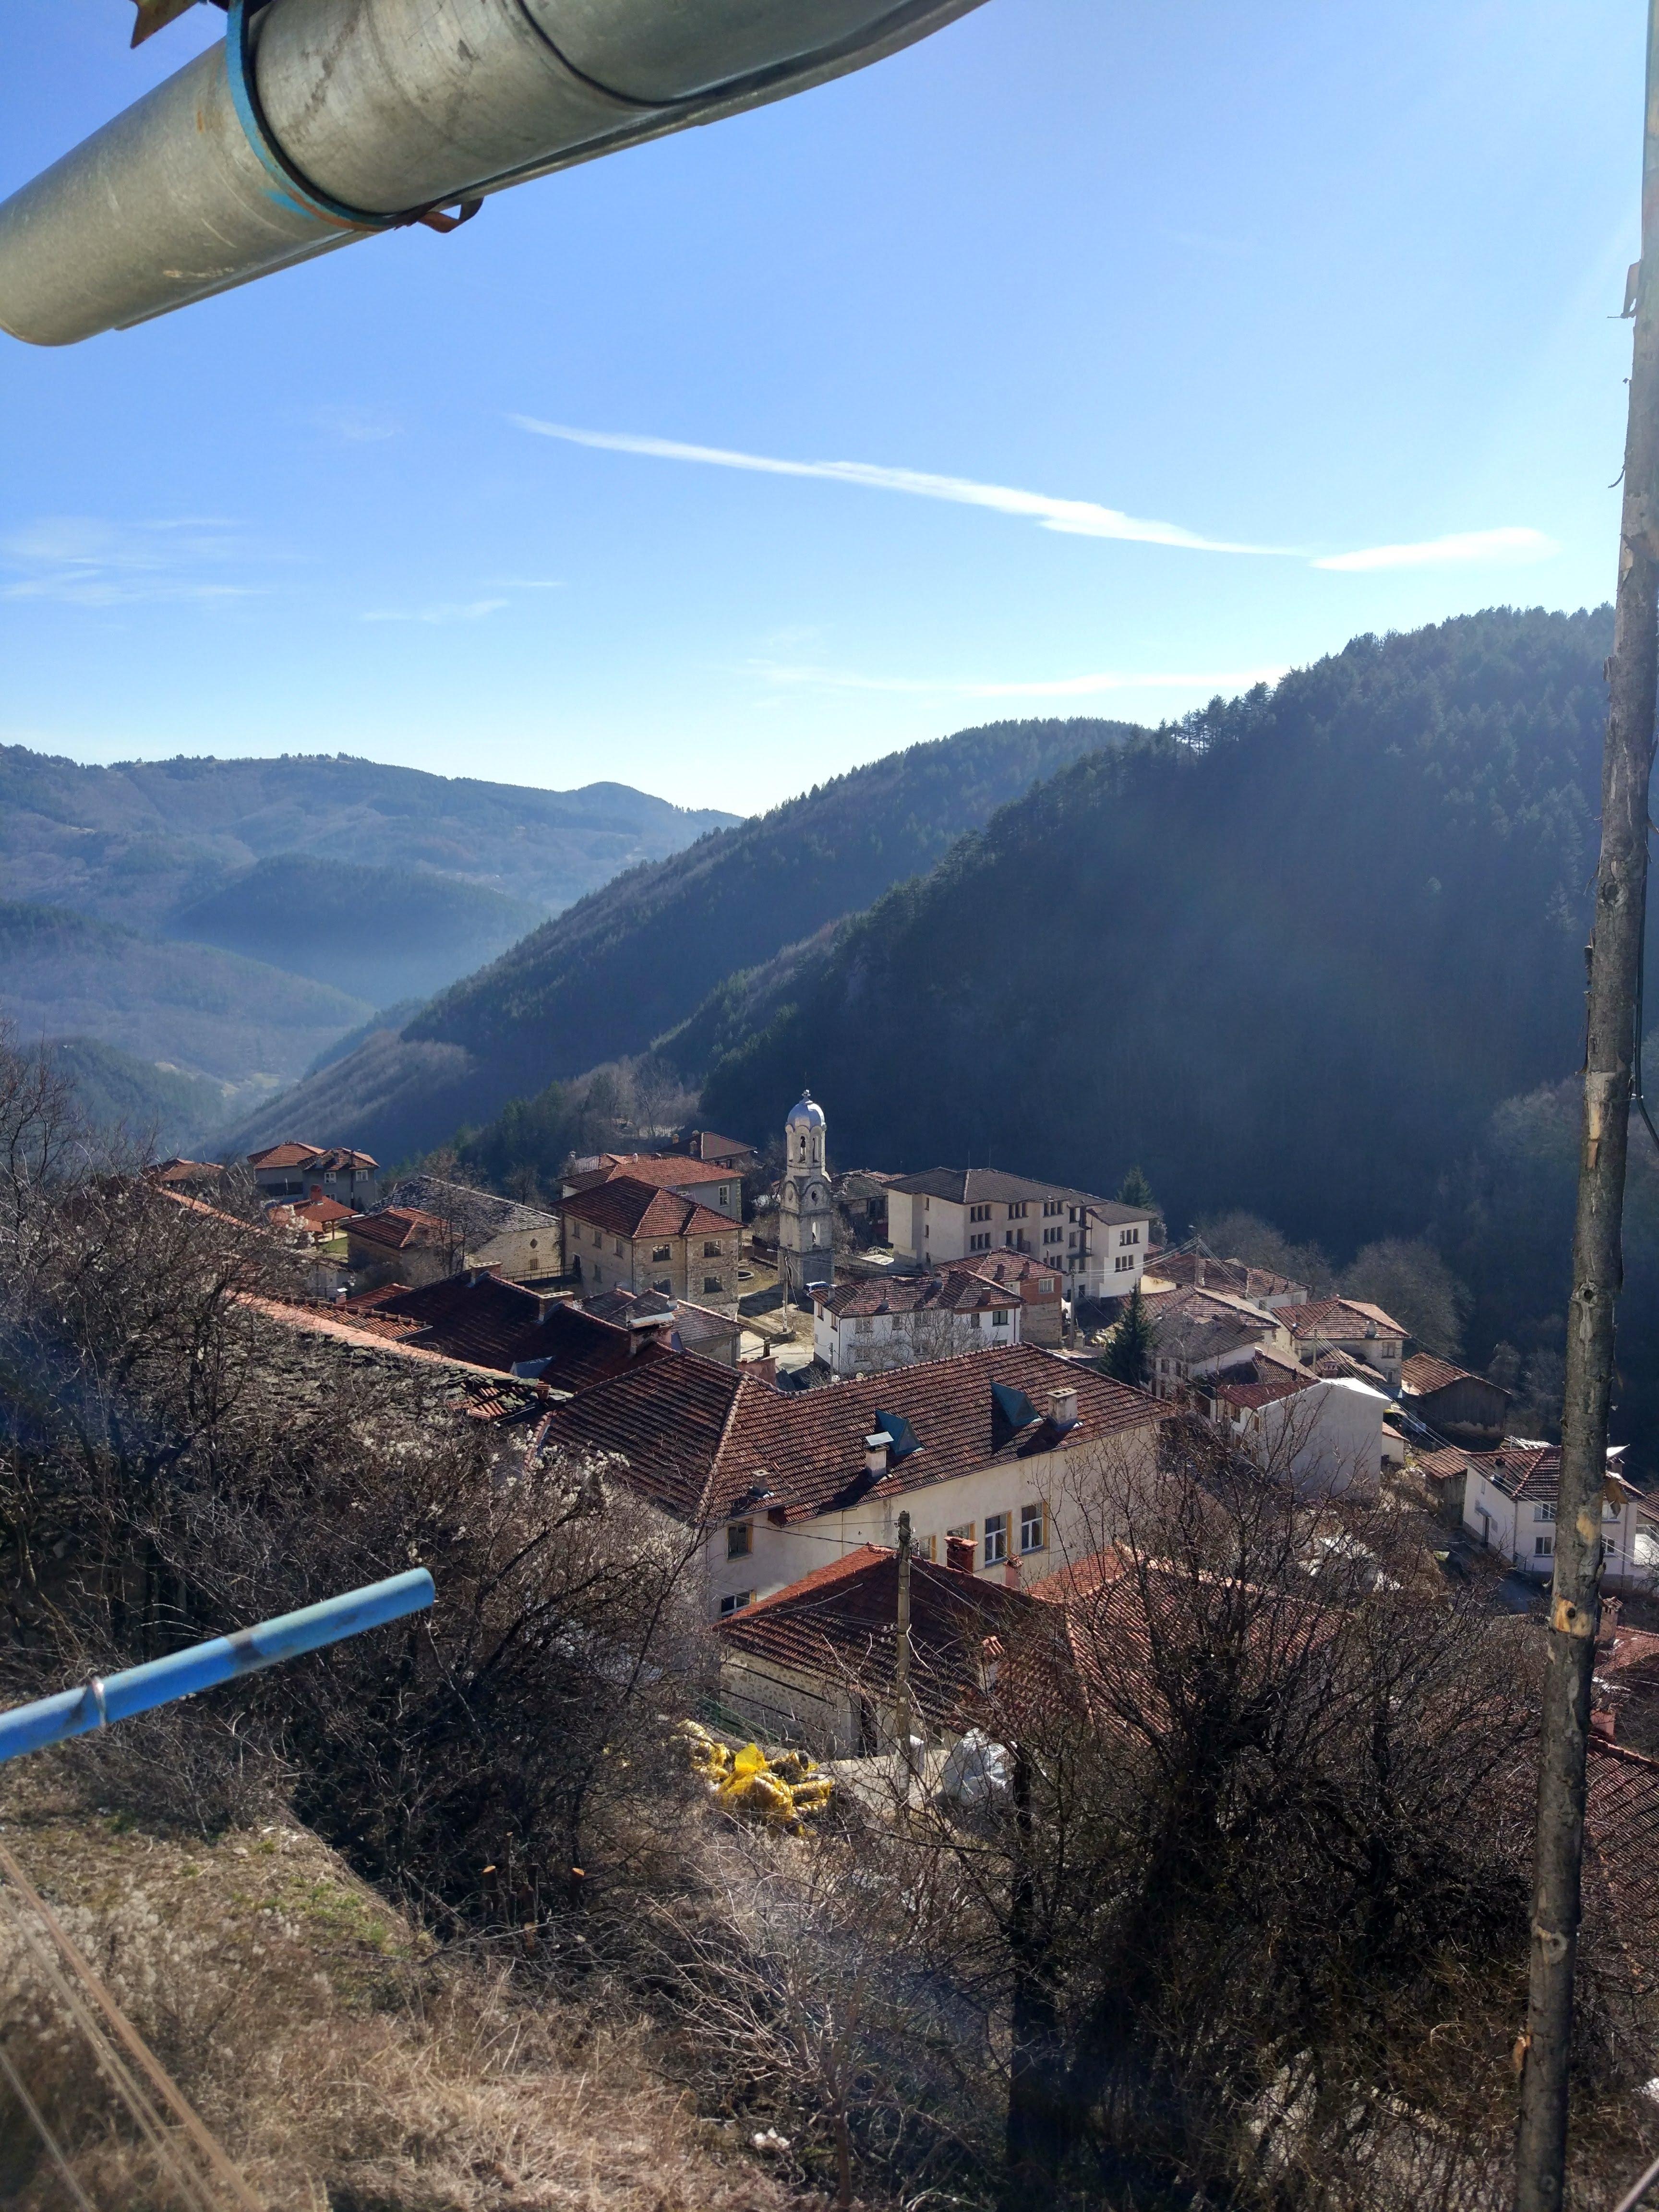 #Levochevo #rodopi #mountain #welcome #Bulgaria #beautiful #nature